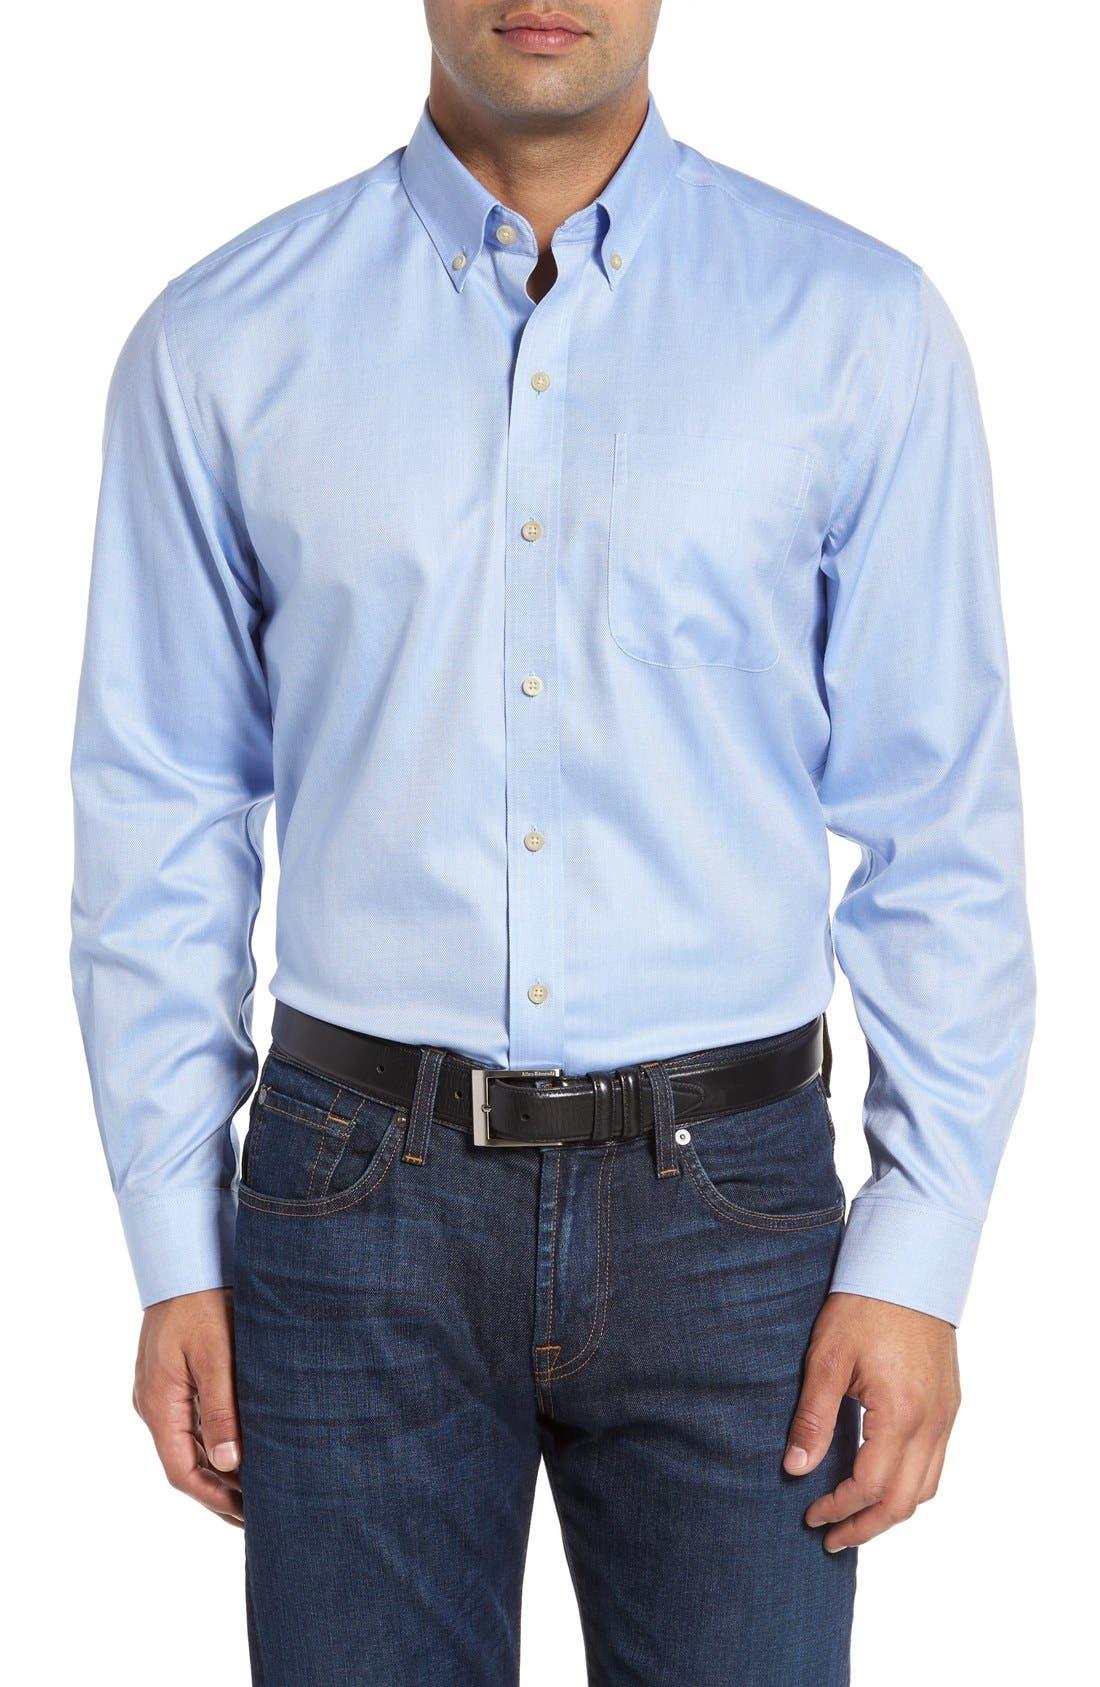 Main Image - Cutter & Buck San Juan Classic Fit Wrinkle Free Solid Sport Shirt